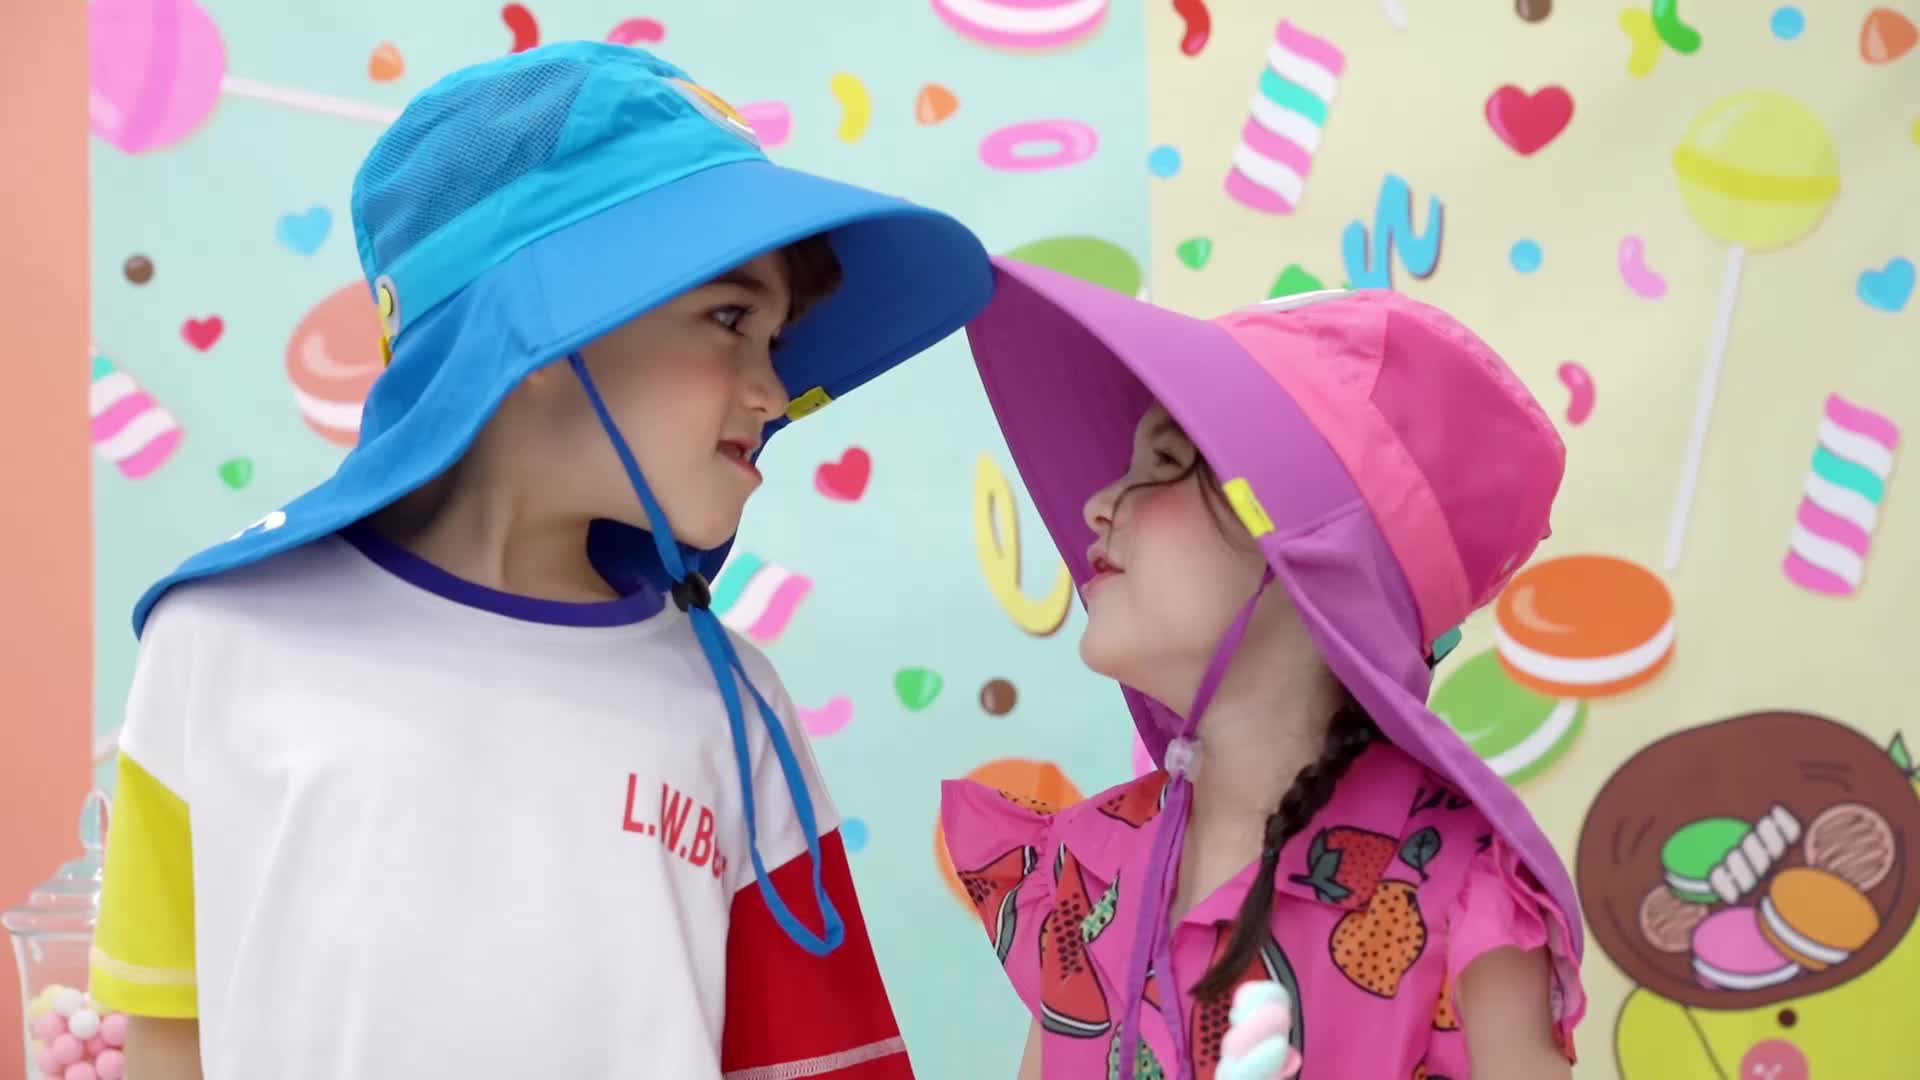 lemonkid柠檬宝宝大帽檐防紫外线太阳帽29002